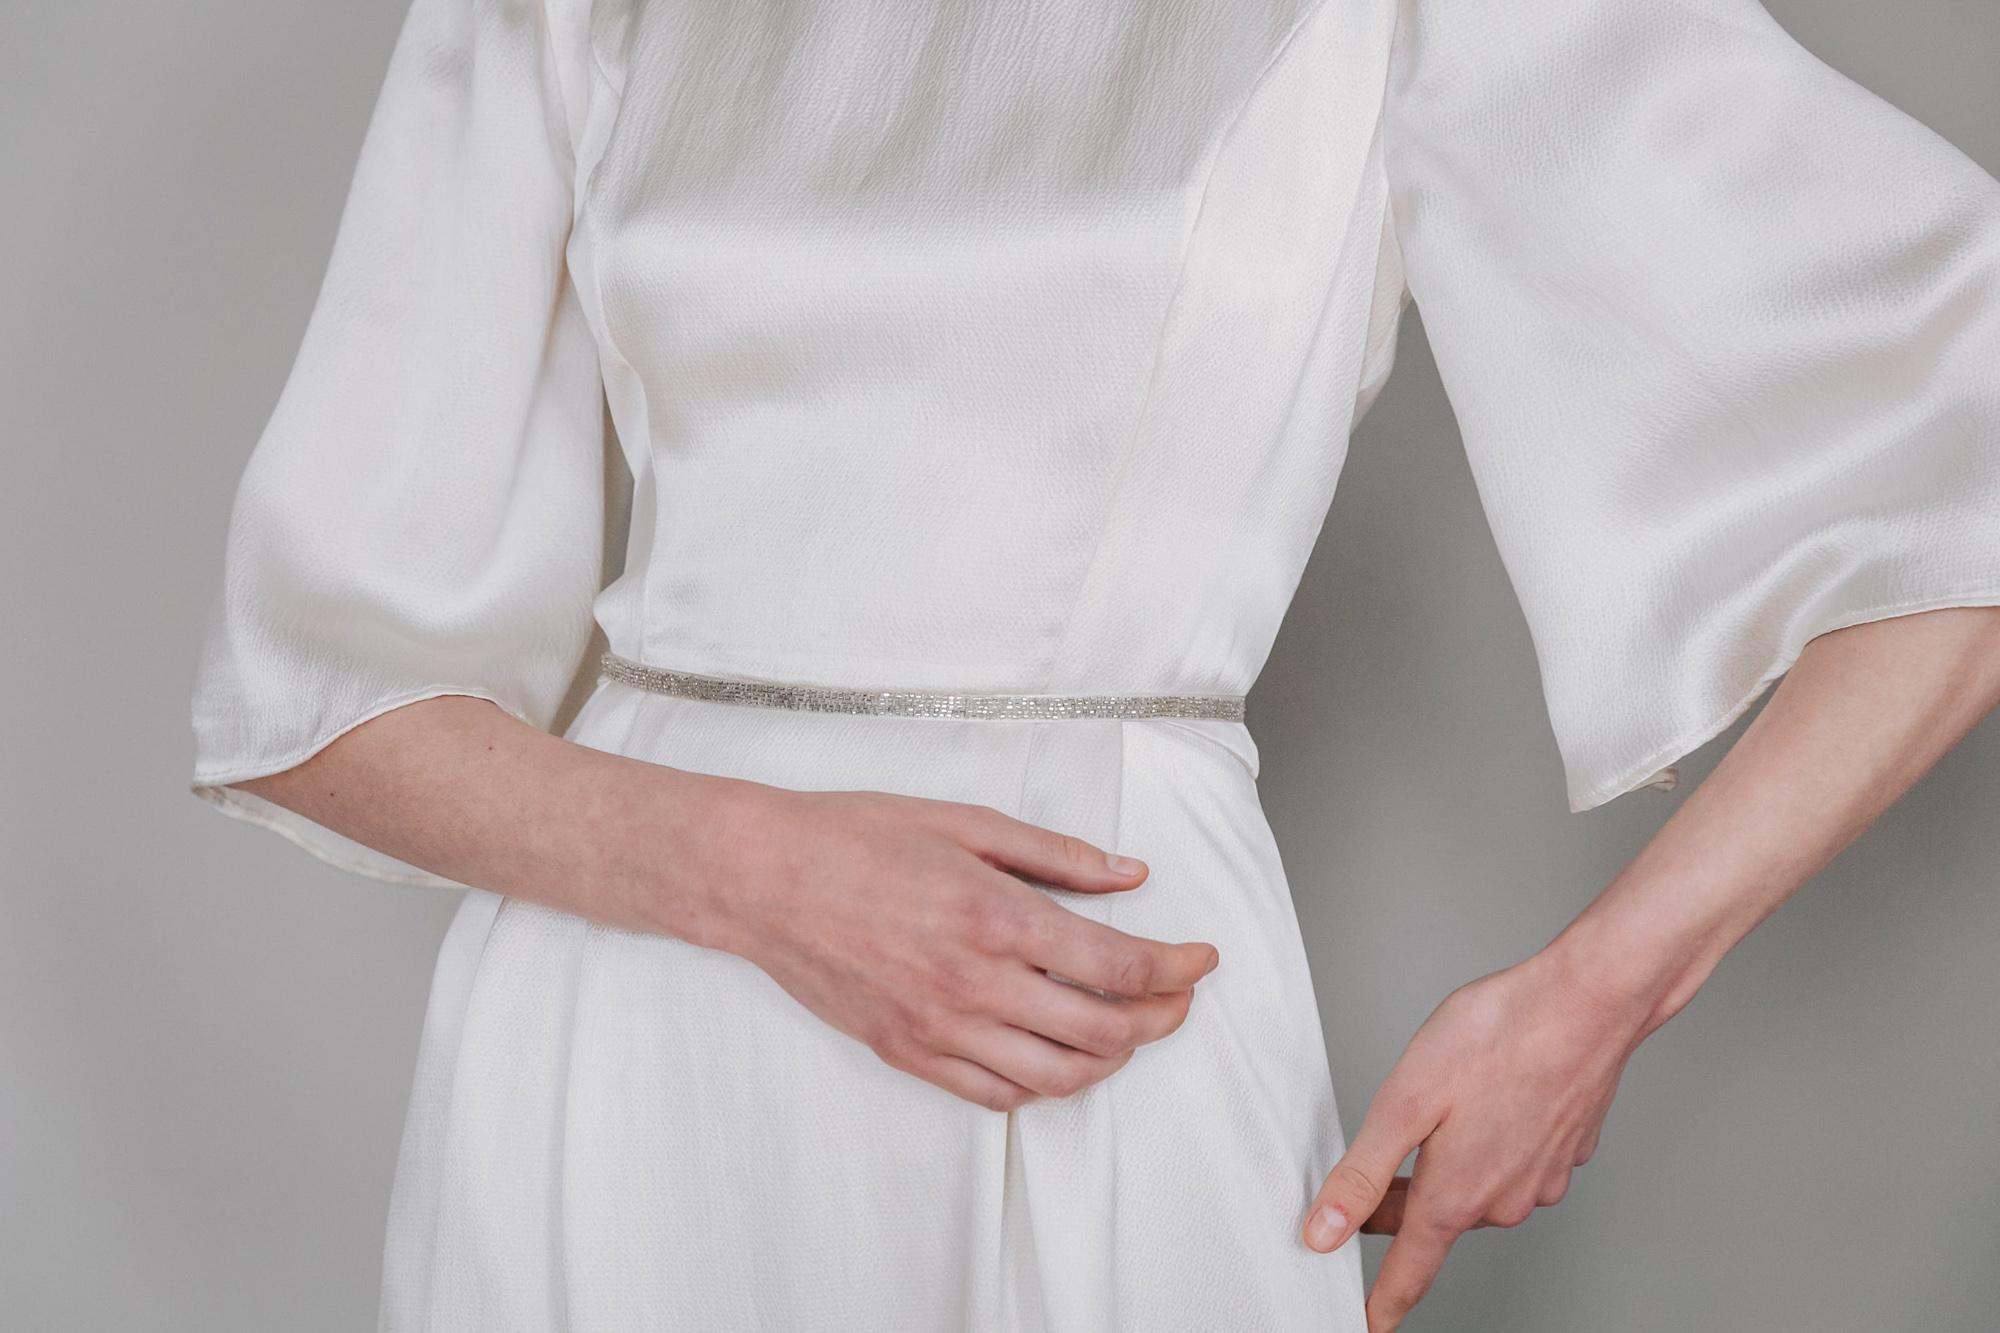 Kate-Beaumont-Lunaria-Bohemian-Hammered-Silk-Wedding-Dress-Sleeves-9.jpg